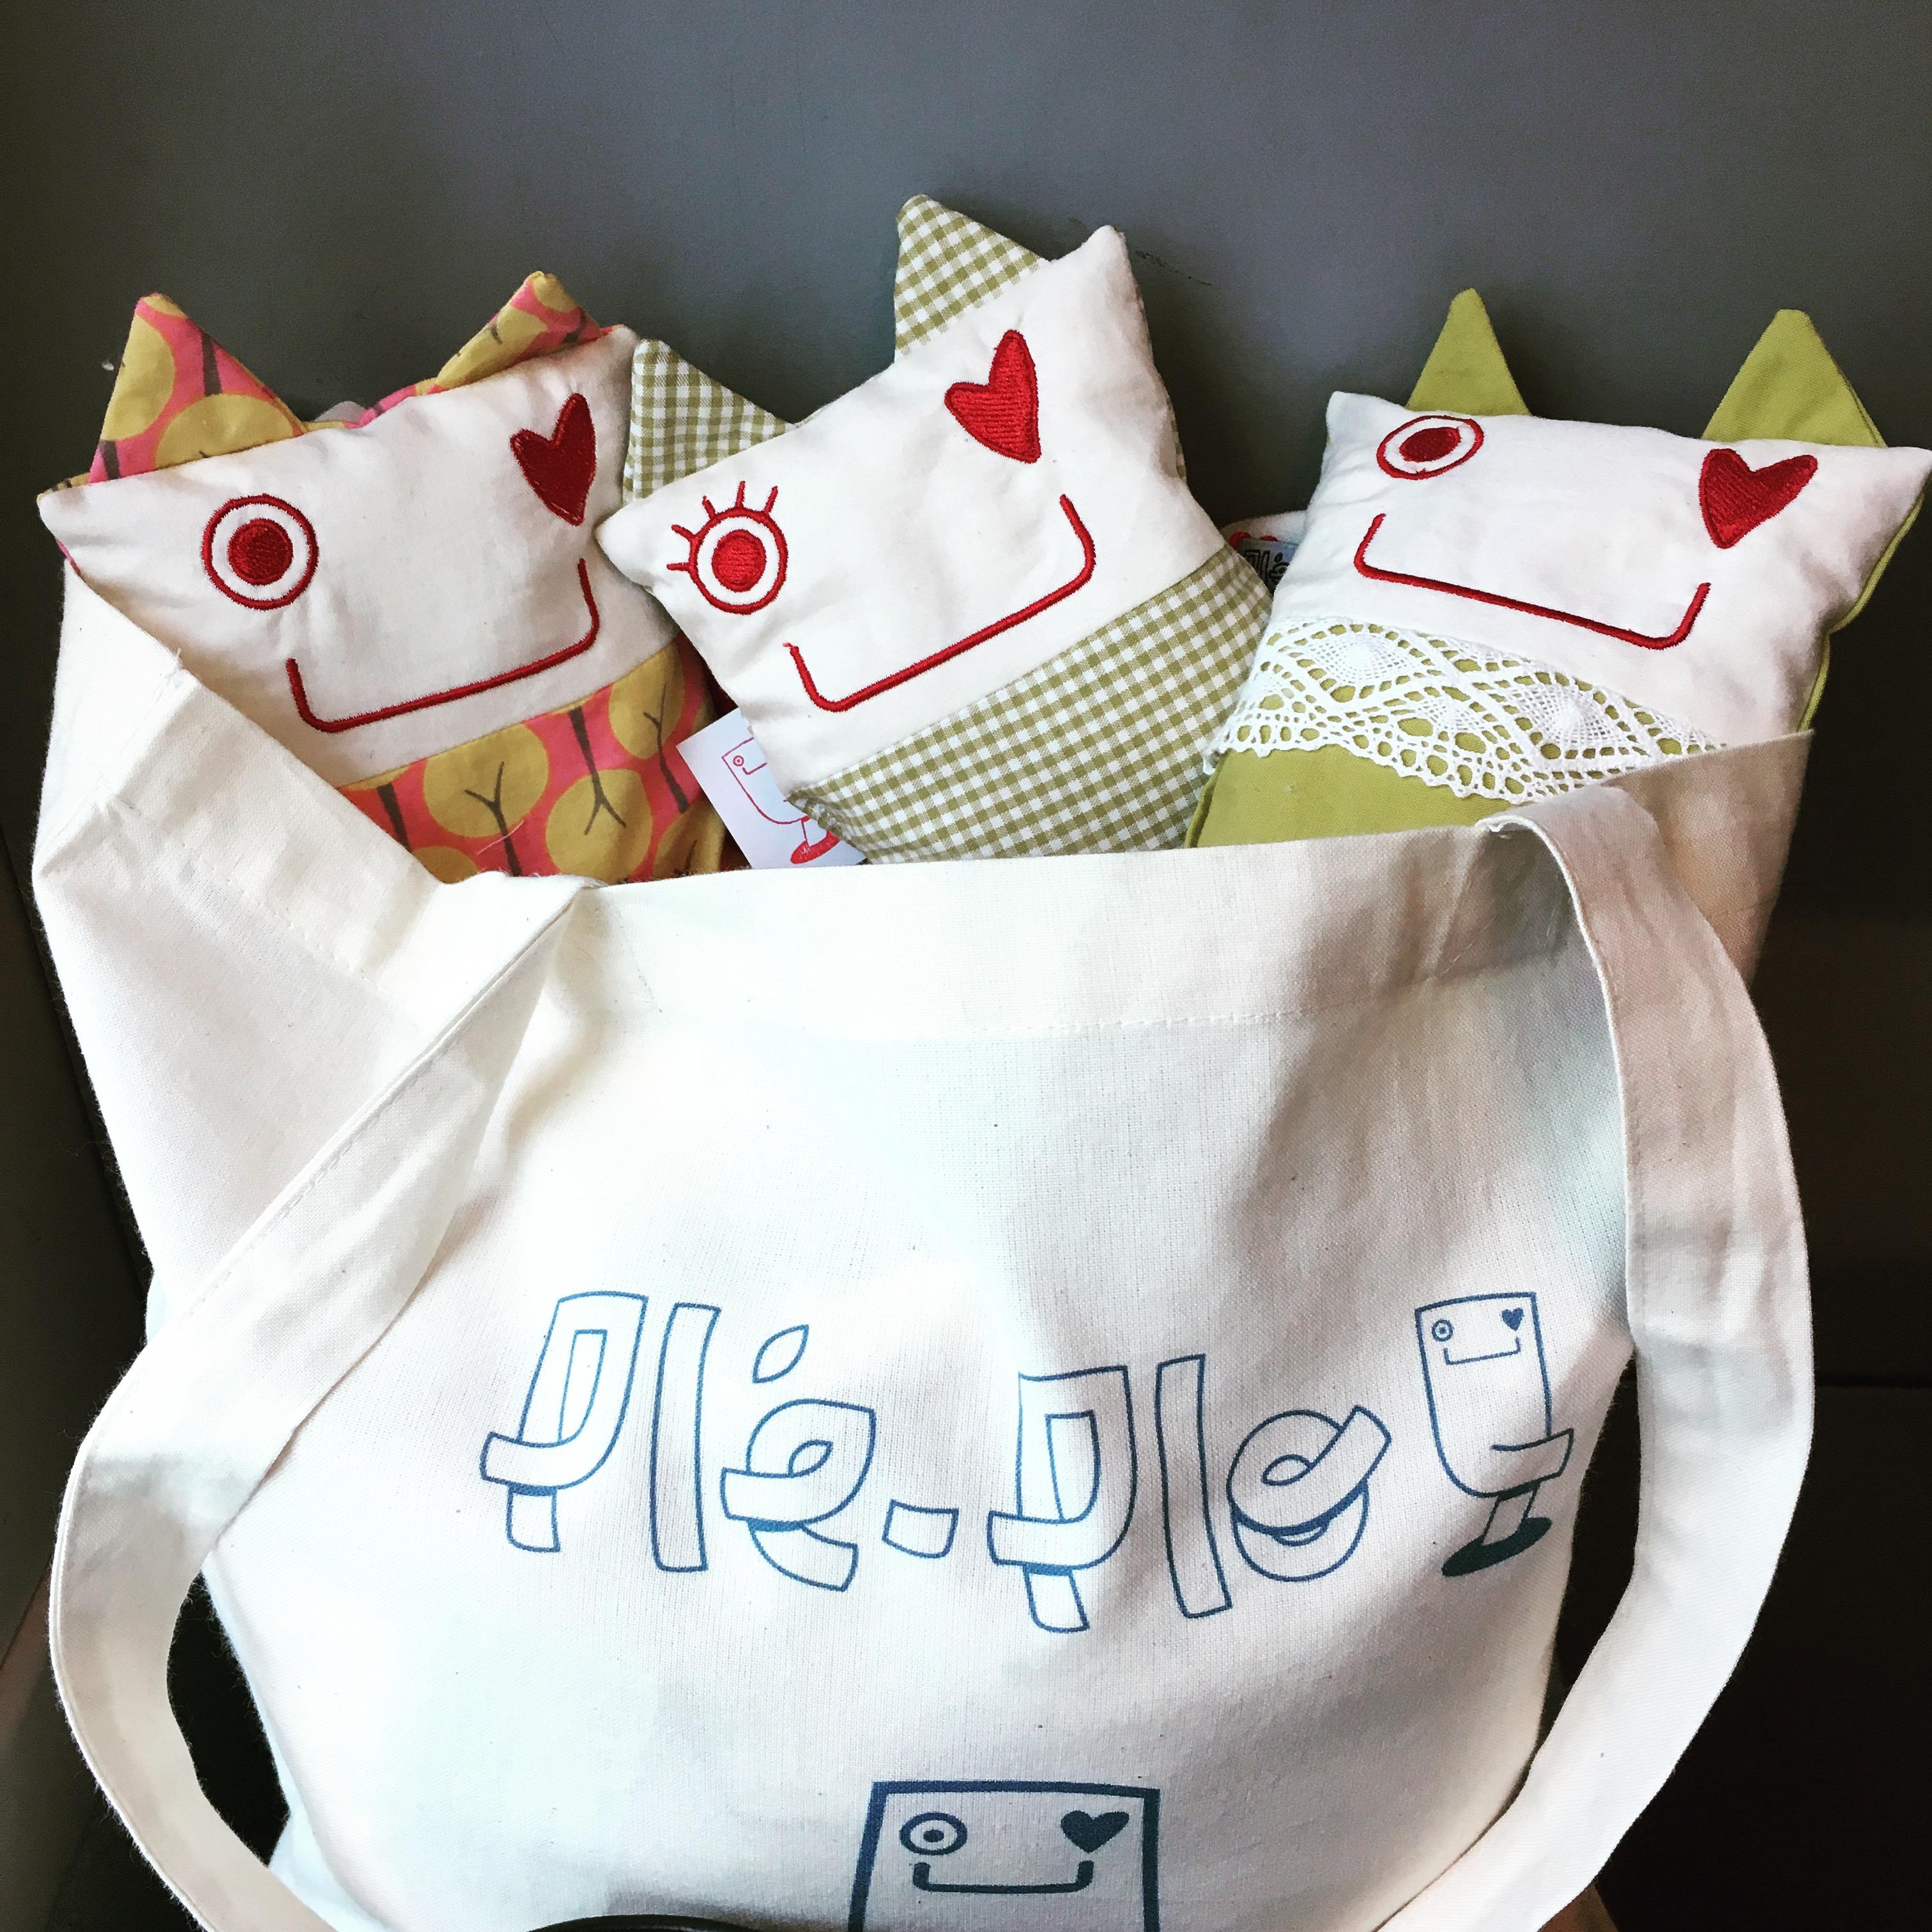 produit pleplo - sac pour tout